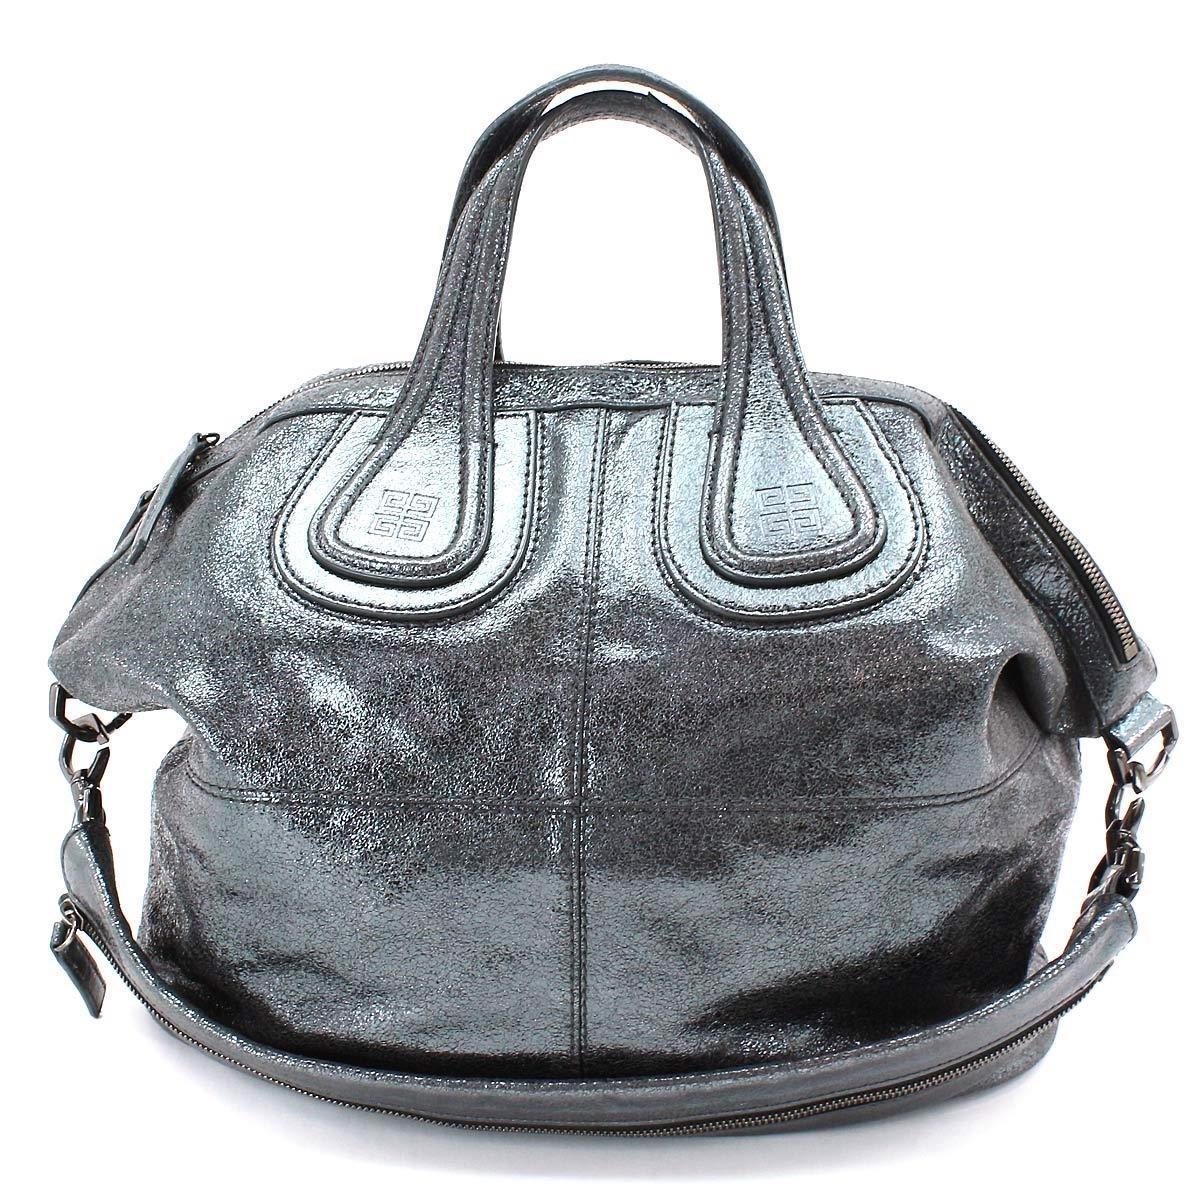 d3d8caeeaa Lyst - Givenchy Nightingale Medium 2way Hand Bag Leather Metallic ...